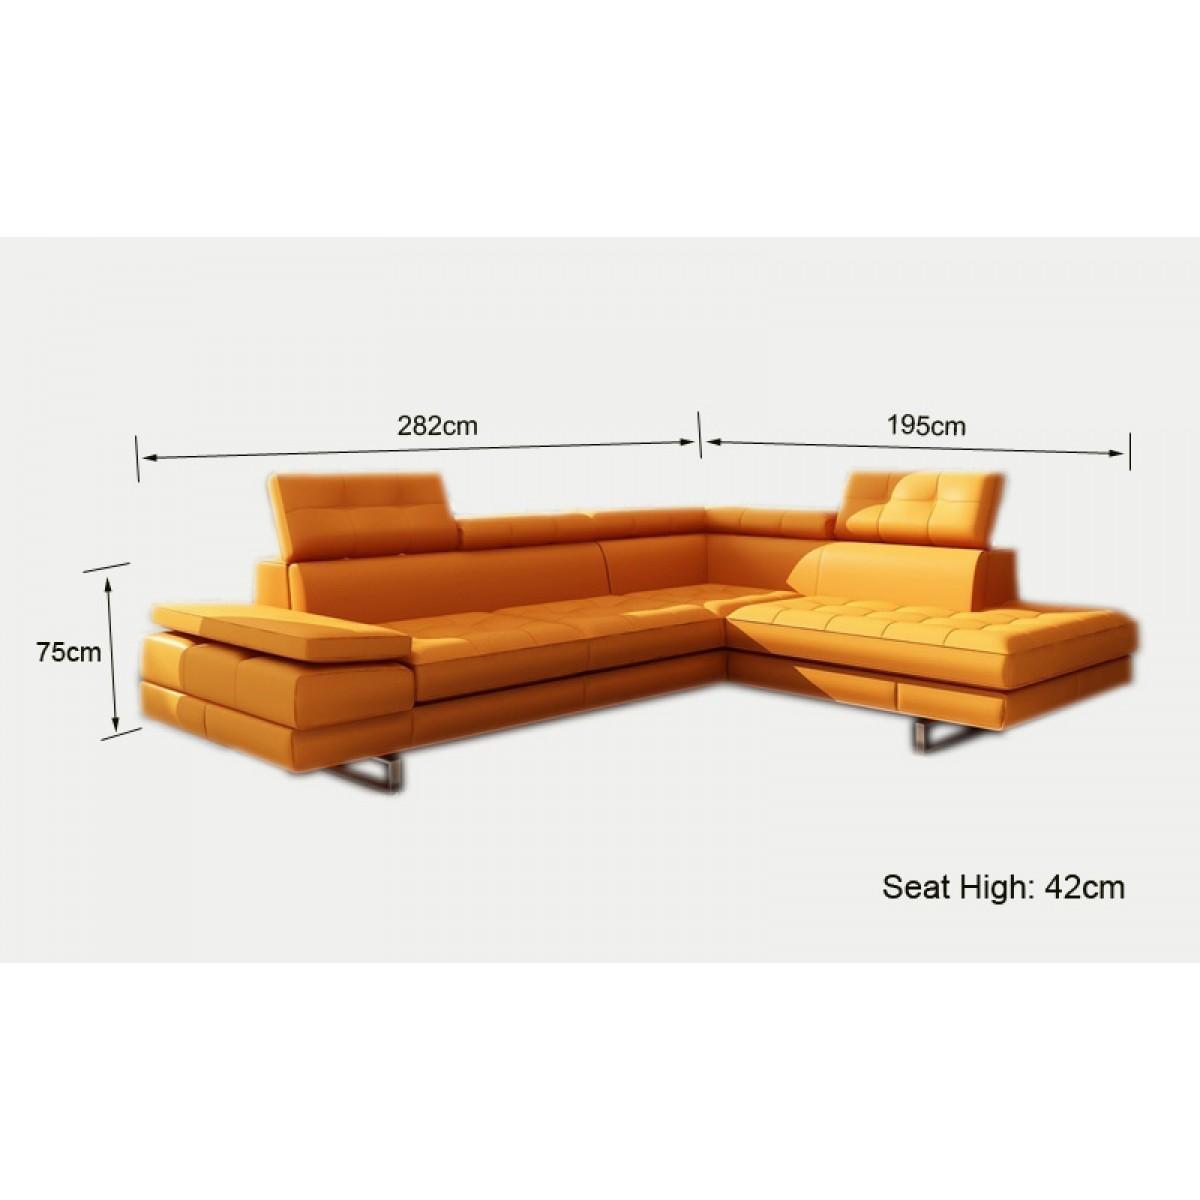 Canap d 39 angle en cuir roanne canap s d 39 angle en cuir - Dimension canape d angle ...